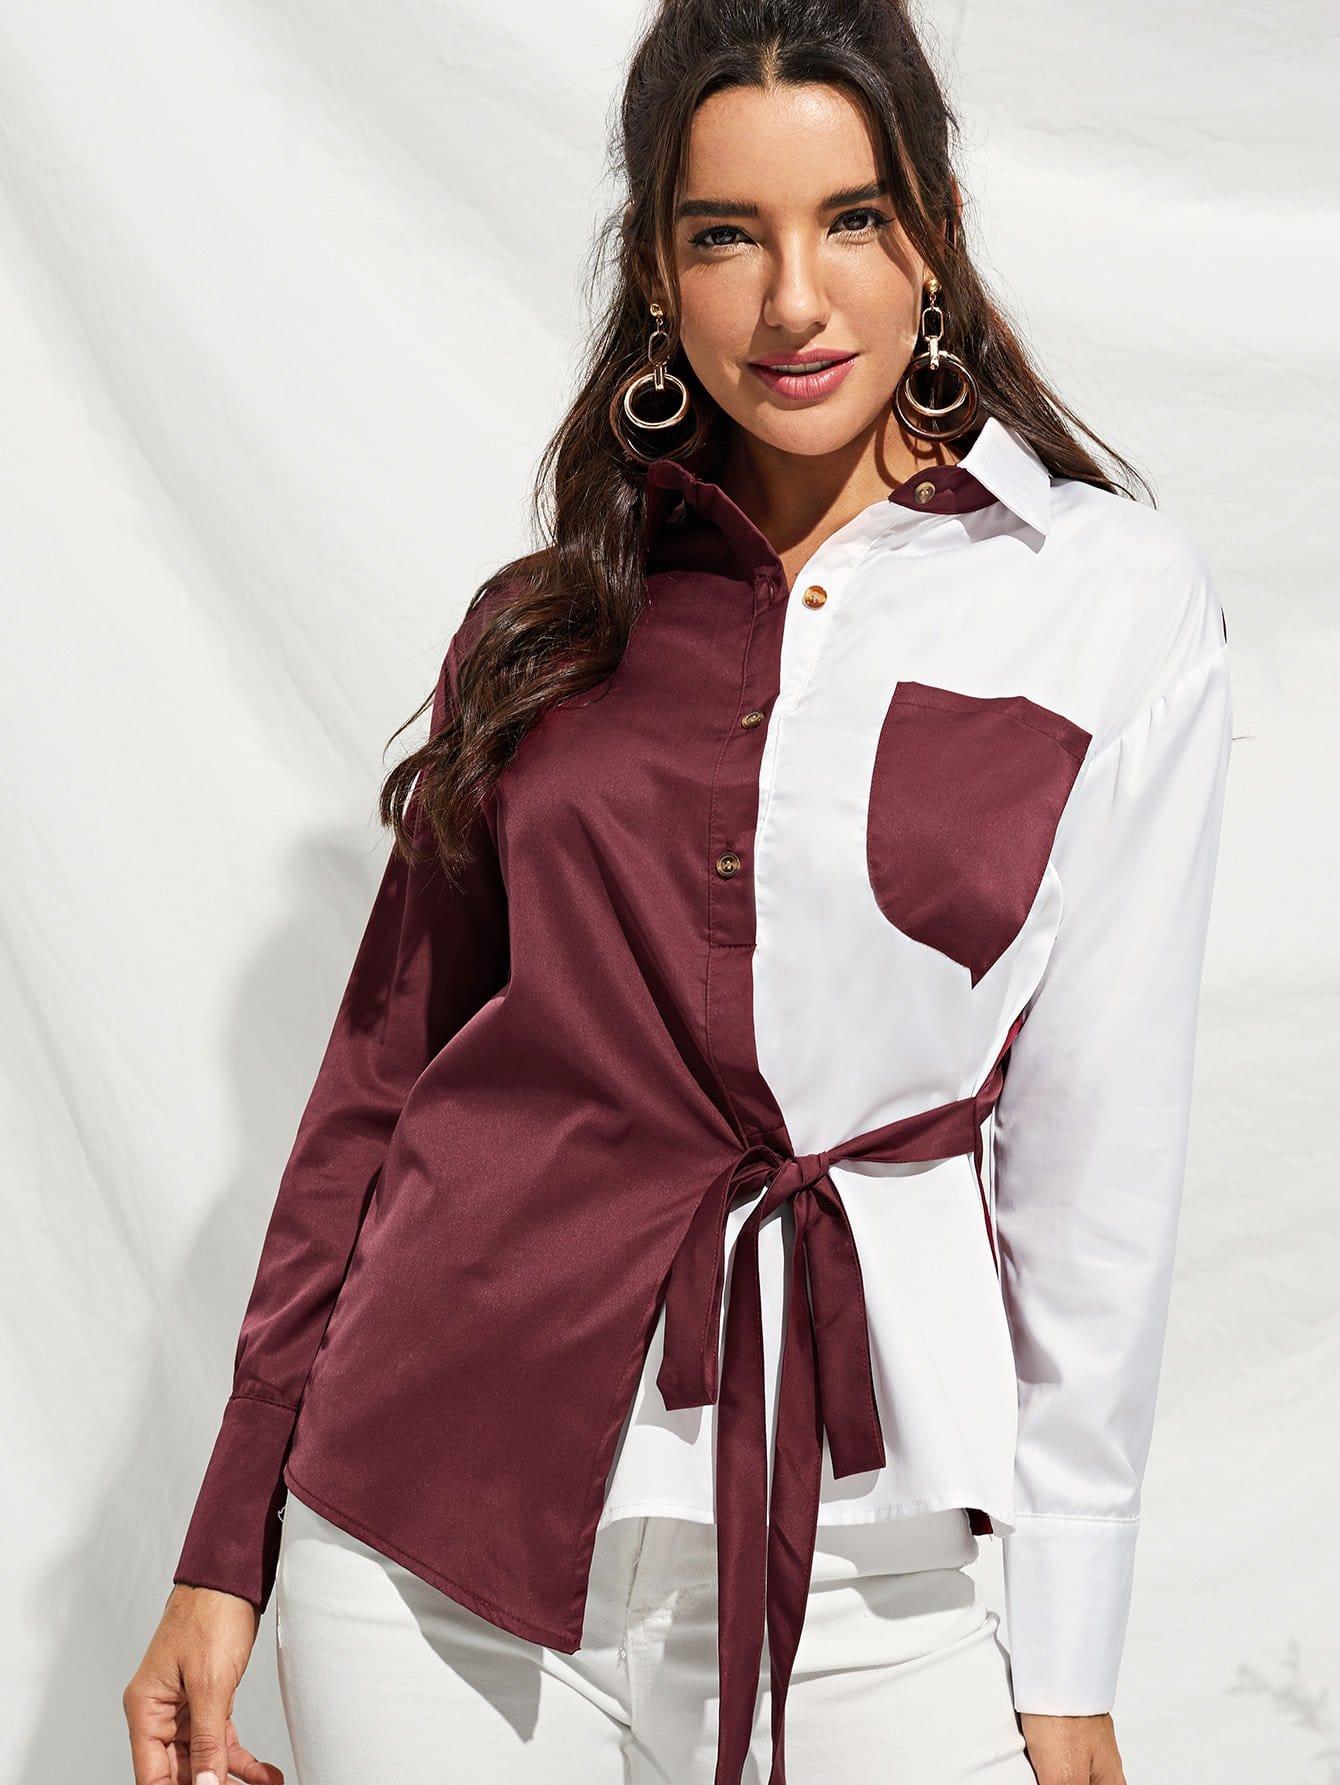 Фото - Асимметричная однобортная блуза с бантом от SheIn бордового цвета